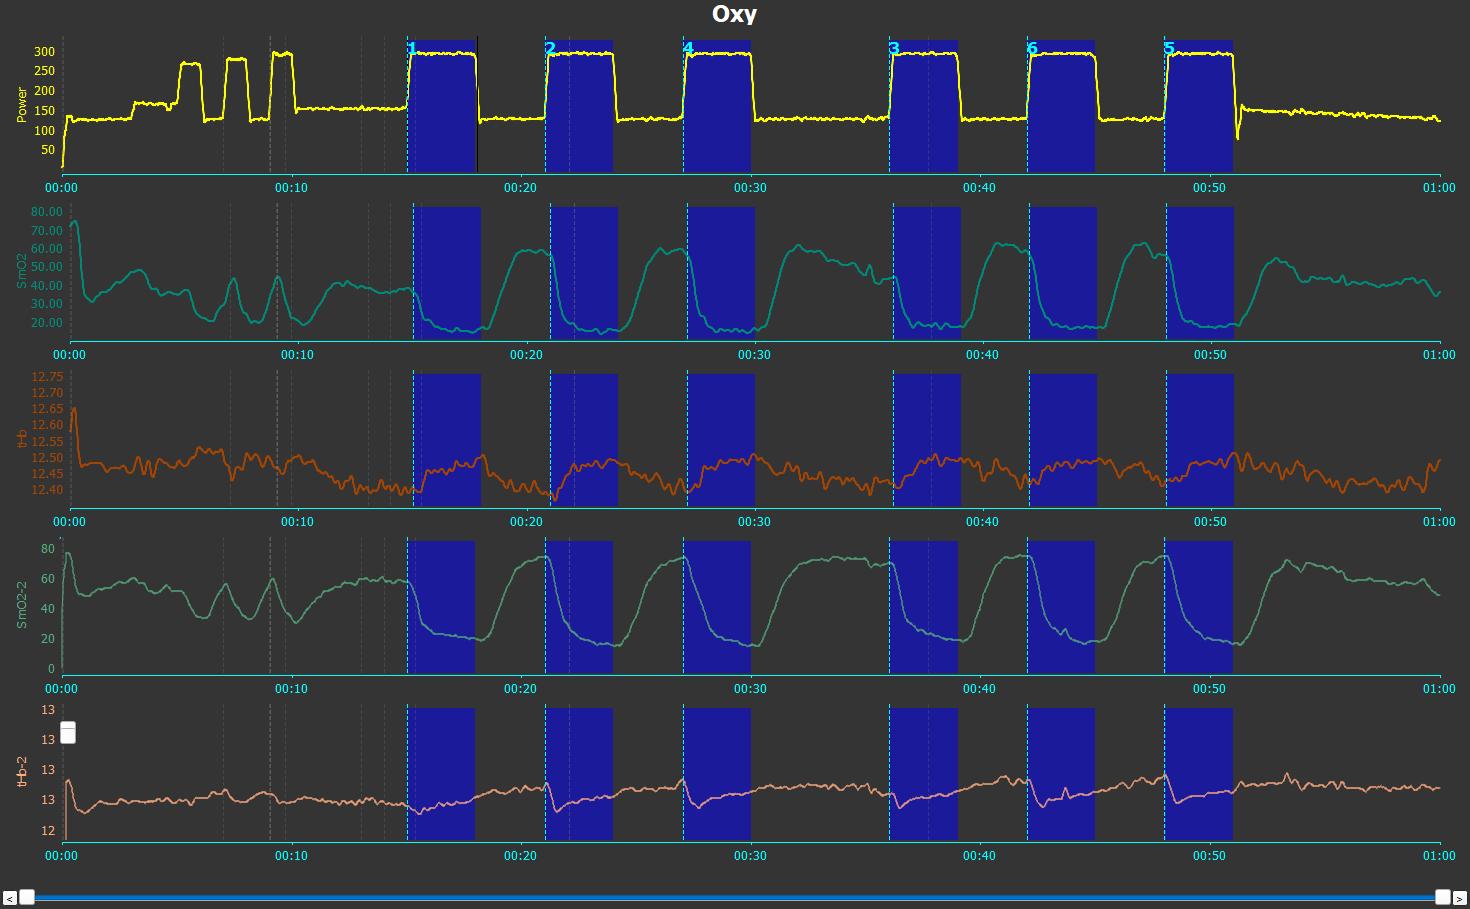 V02 intervals Oxy.png